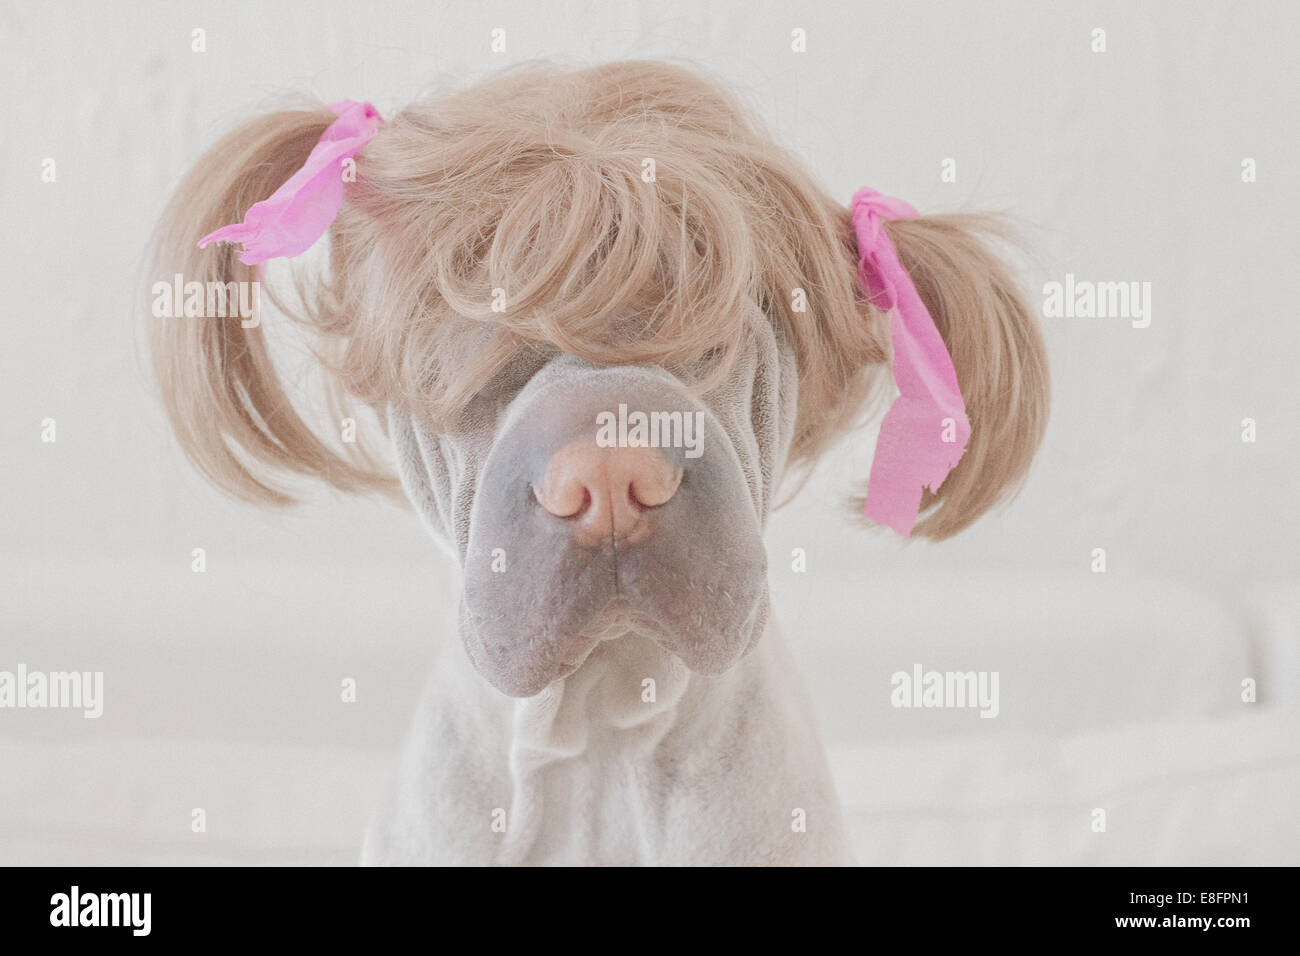 Hund trägt Perücke mit Zöpfen Stockbild